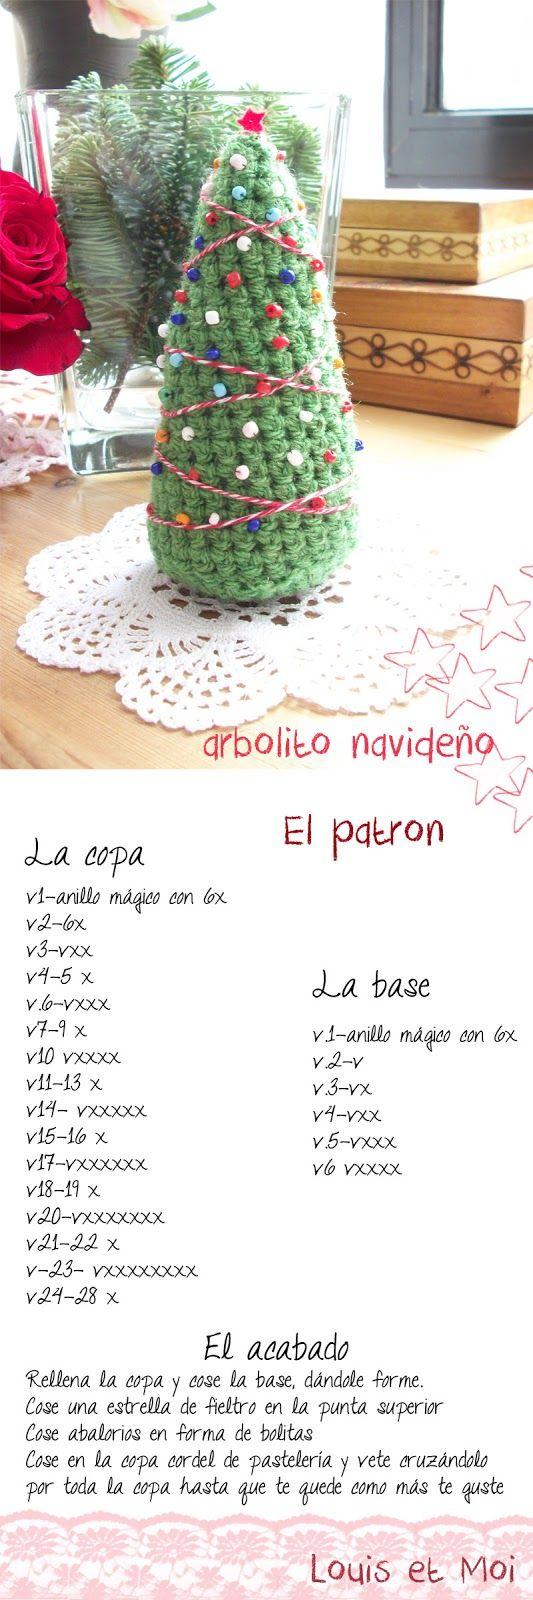 Árbol Navideño Patrón Gratis en Español: | Tejidos | Pinterest | Crochet